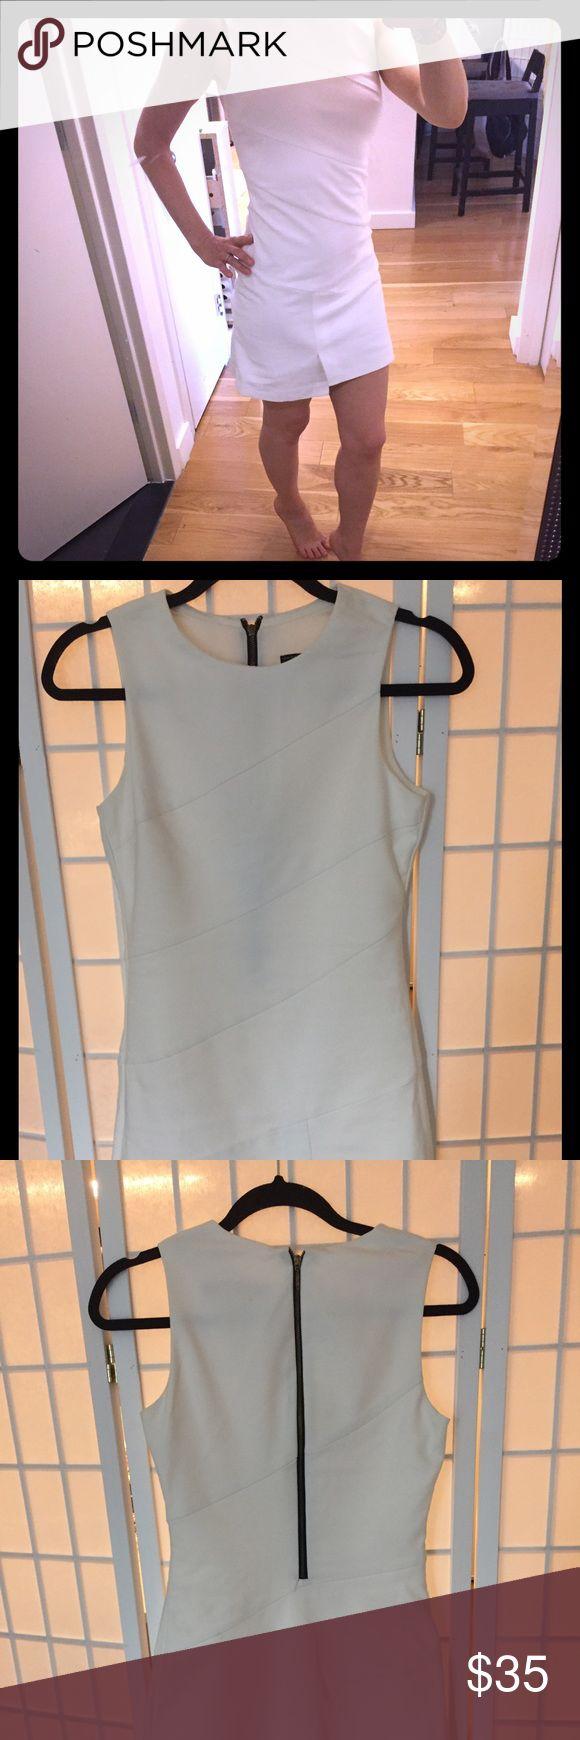 White dress White summer dress in great condition. Zara Dresses Mini